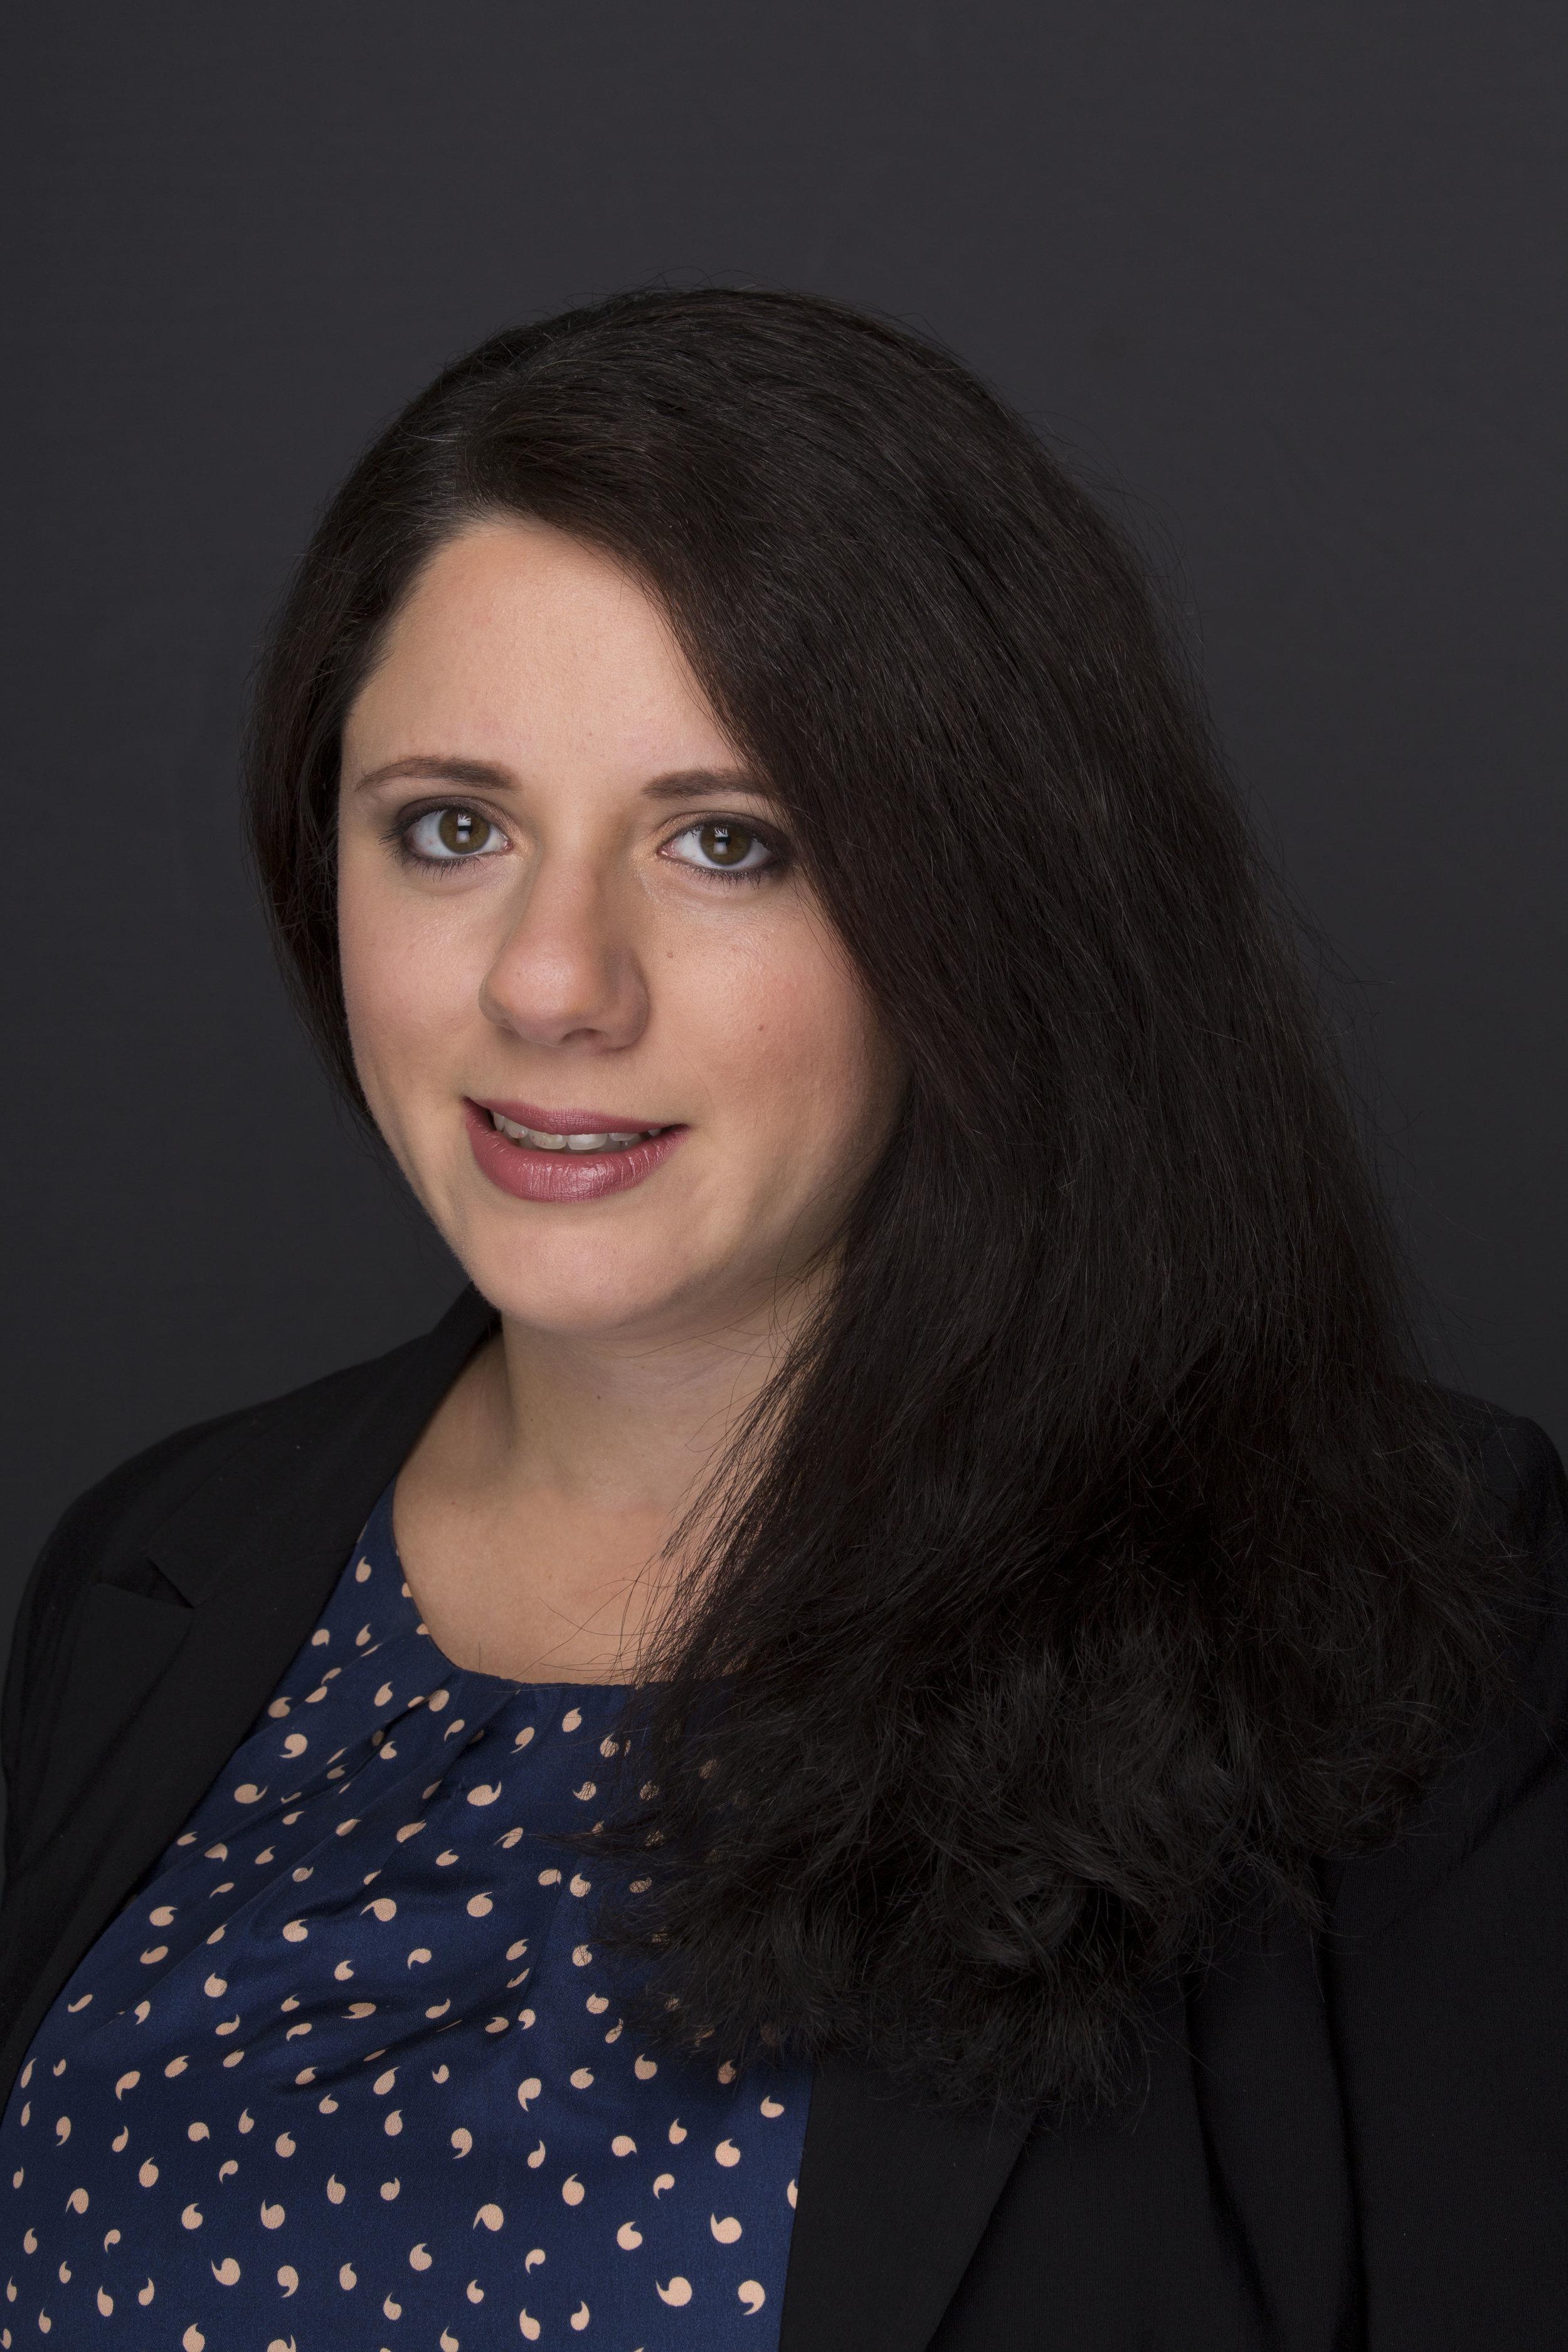 Belinda Drivas - Senior AssociateE bvd@bwslawyers.com.auP 02 9394 1035